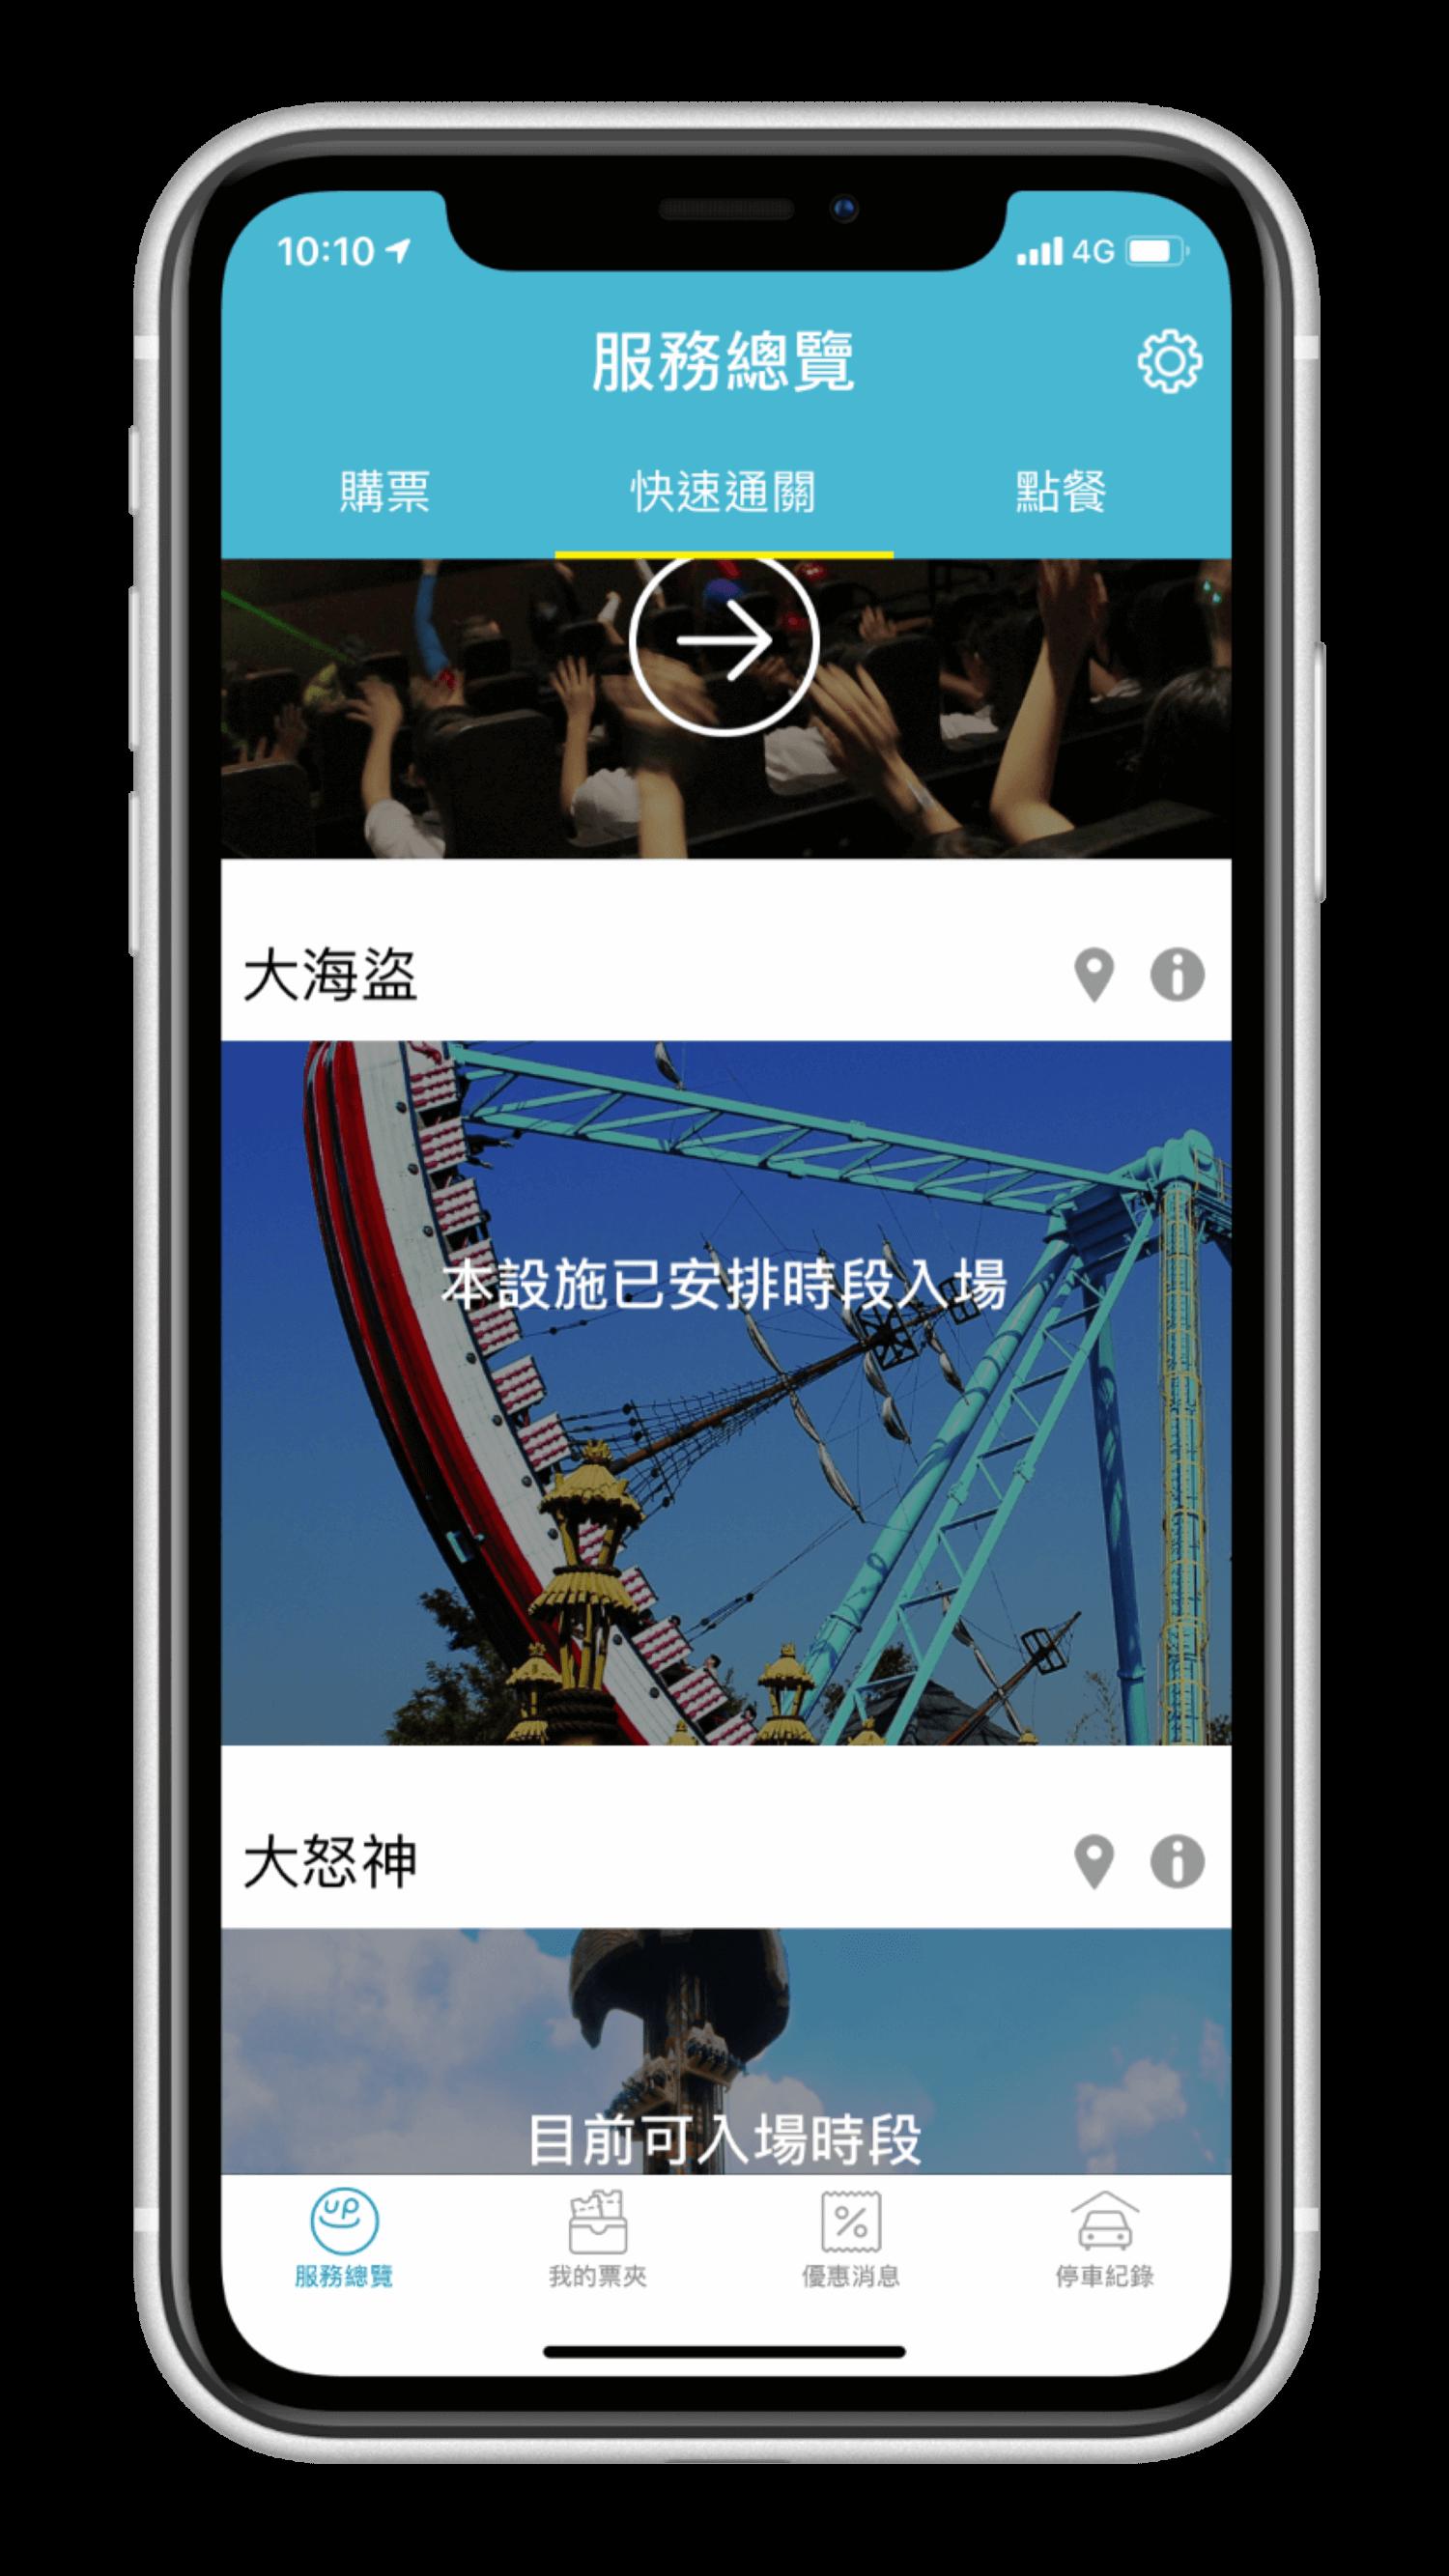 Lineup 六福村快速通關 APP 預約設施